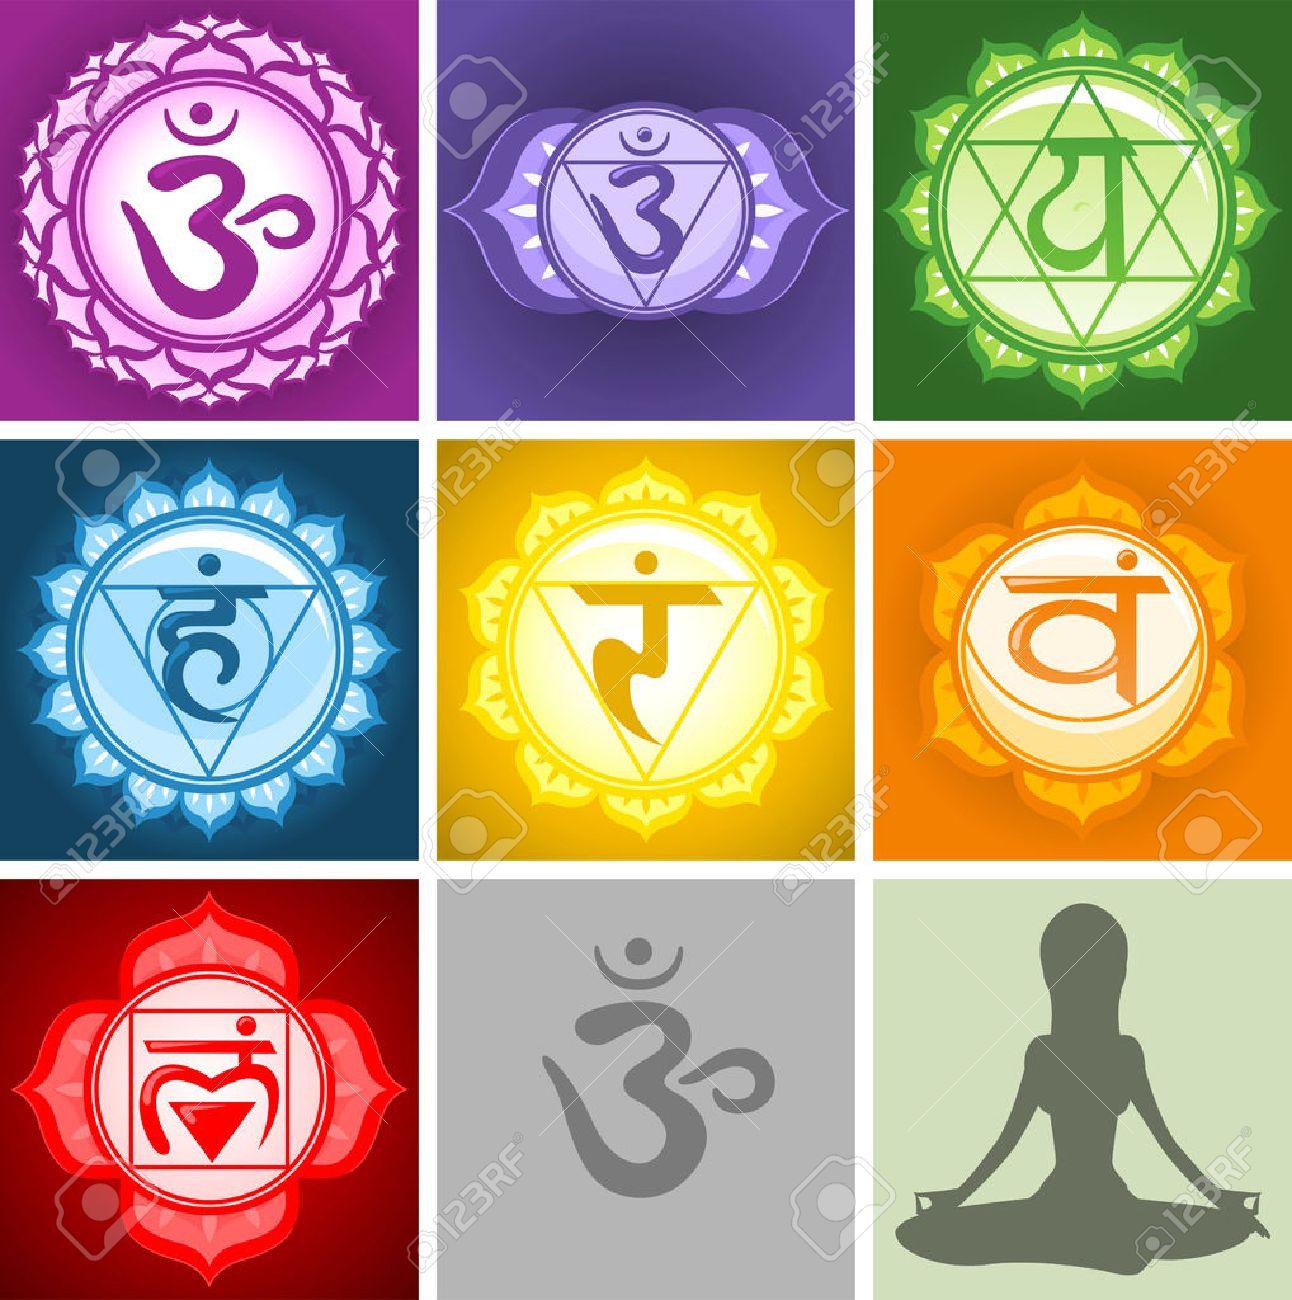 Chakra stock photos royalty free business images yoga chakras symbols collection illustration buycottarizona